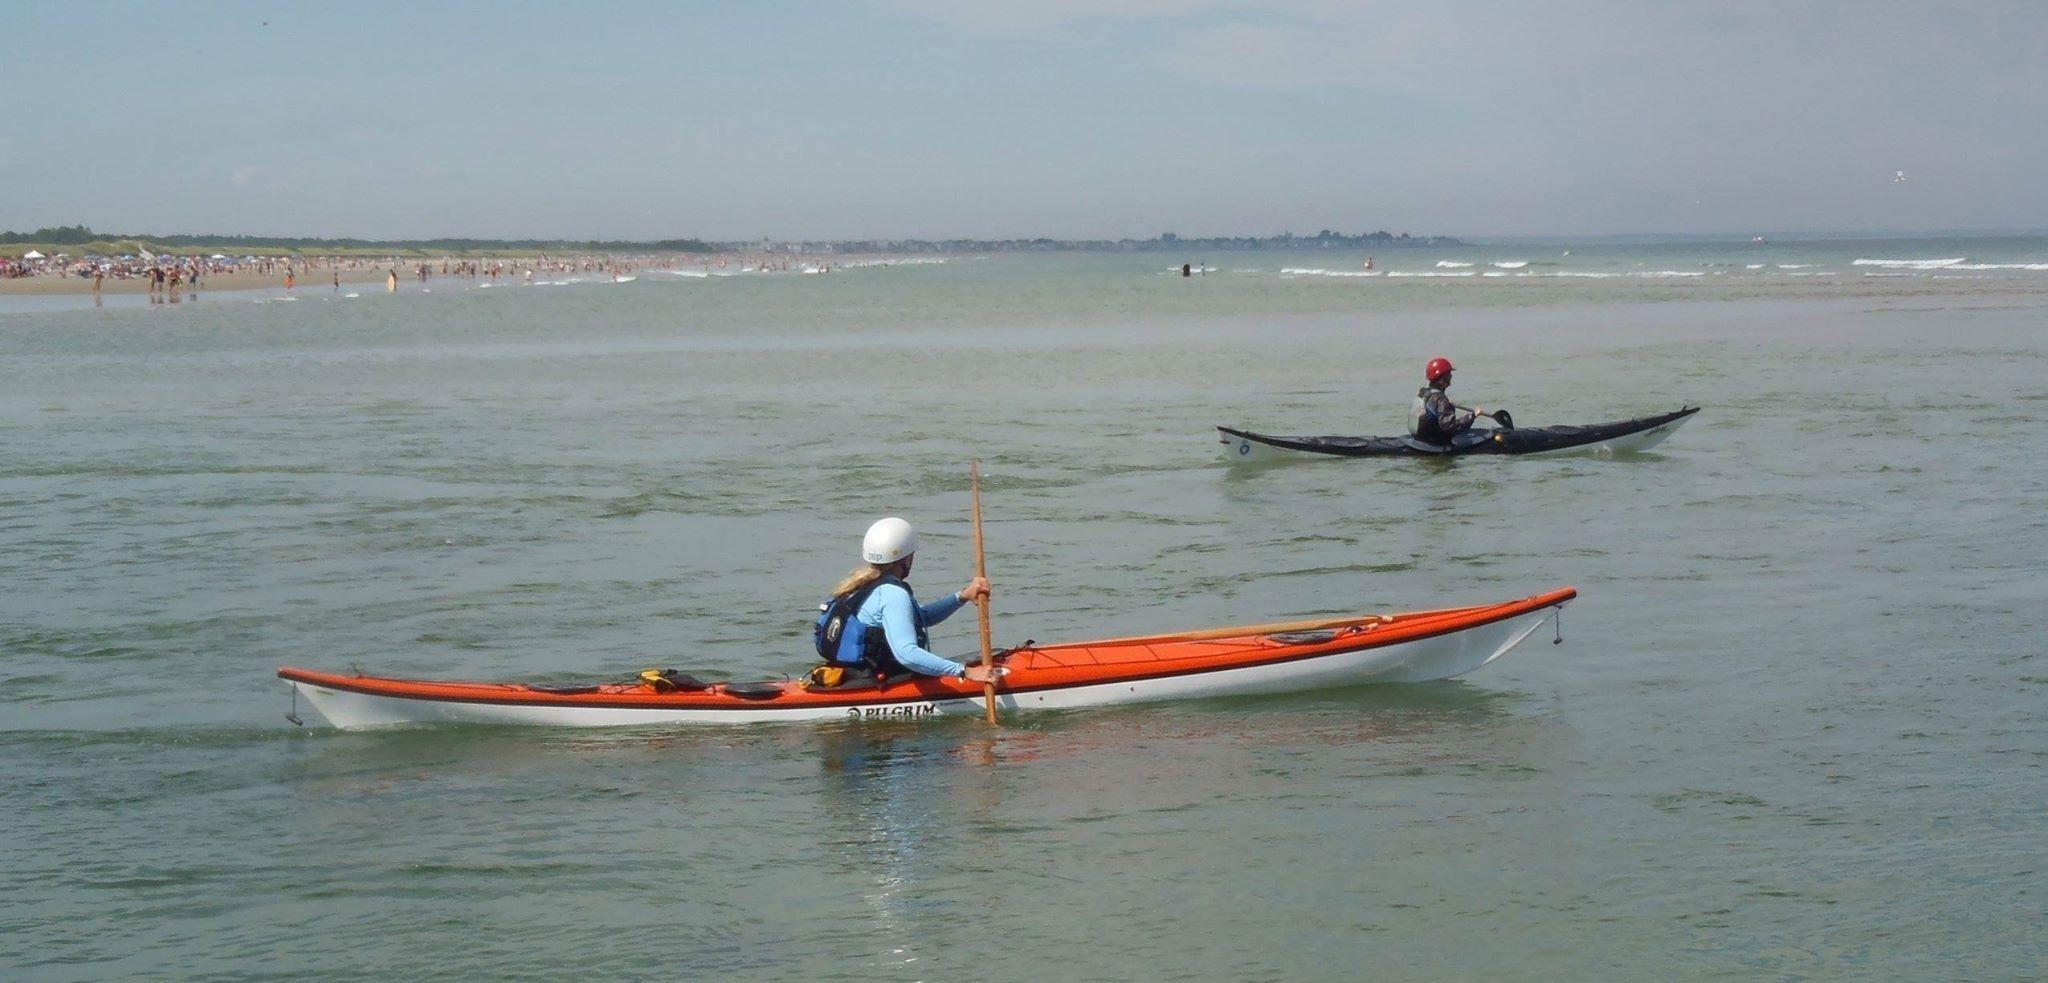 Craigslist Kayak For Sale Charlotte Nc - Kayak Explorer